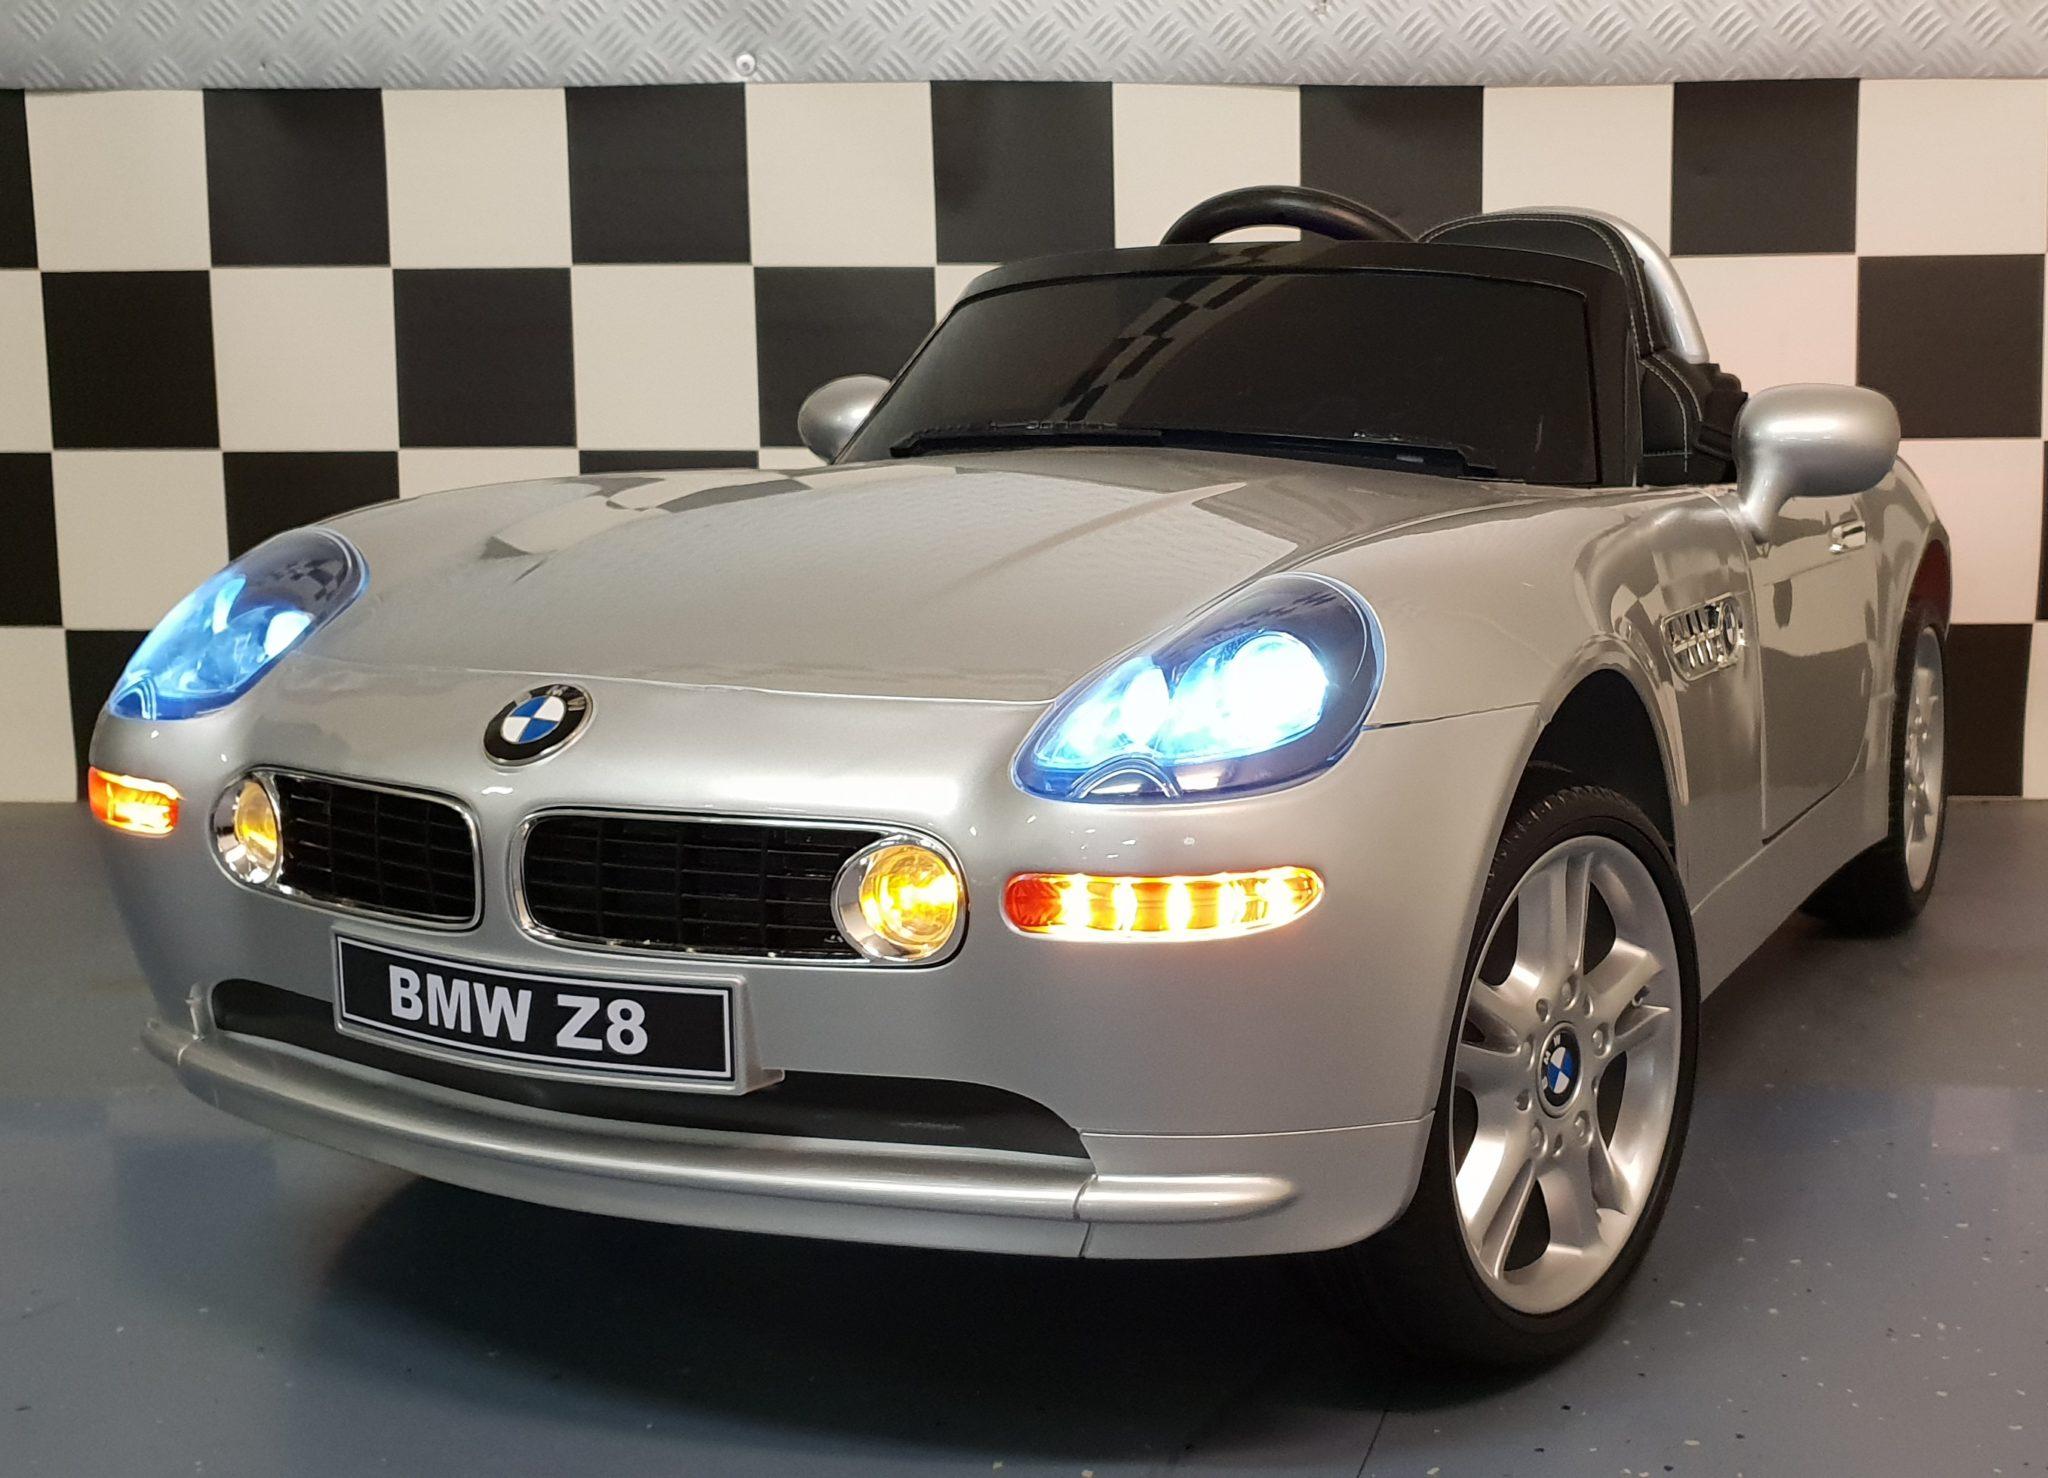 Kinder accu speelgoedauto BMW Z8 met afstandsbediening